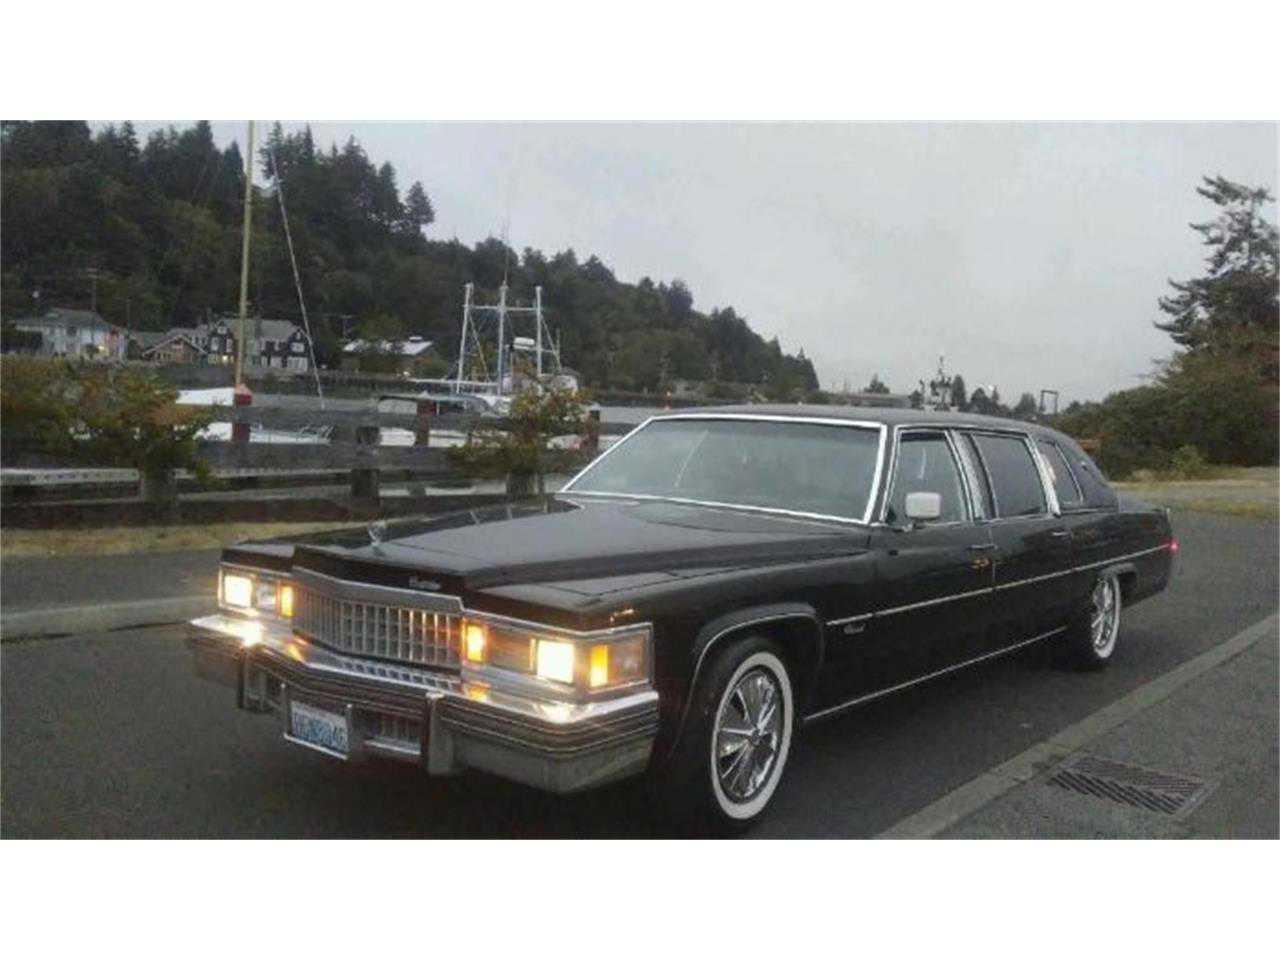 1978 Cadillac Fleetwood For Sale 1951 Sedan